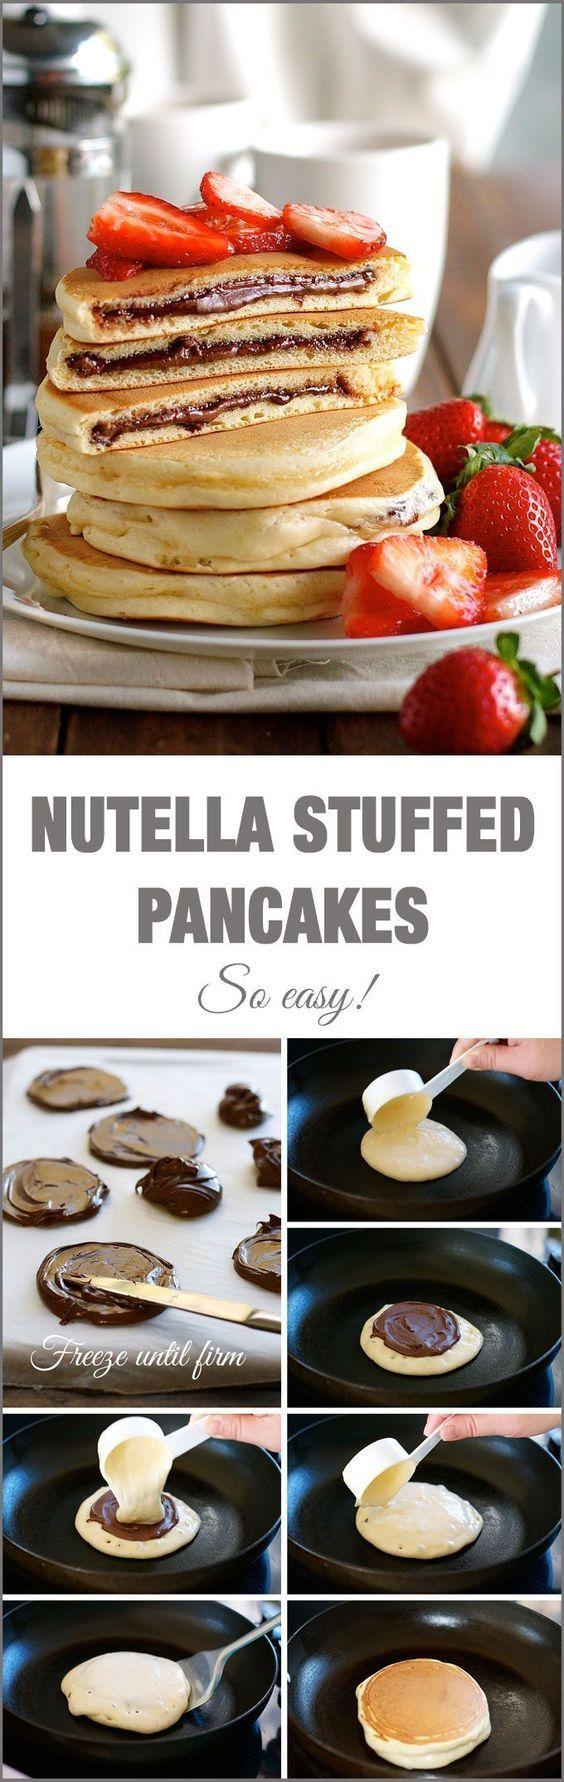 Nutella Stuffed Pancakes - frozen Nutella discs makes it a breeze to make the Nutella stuffed pancakes!